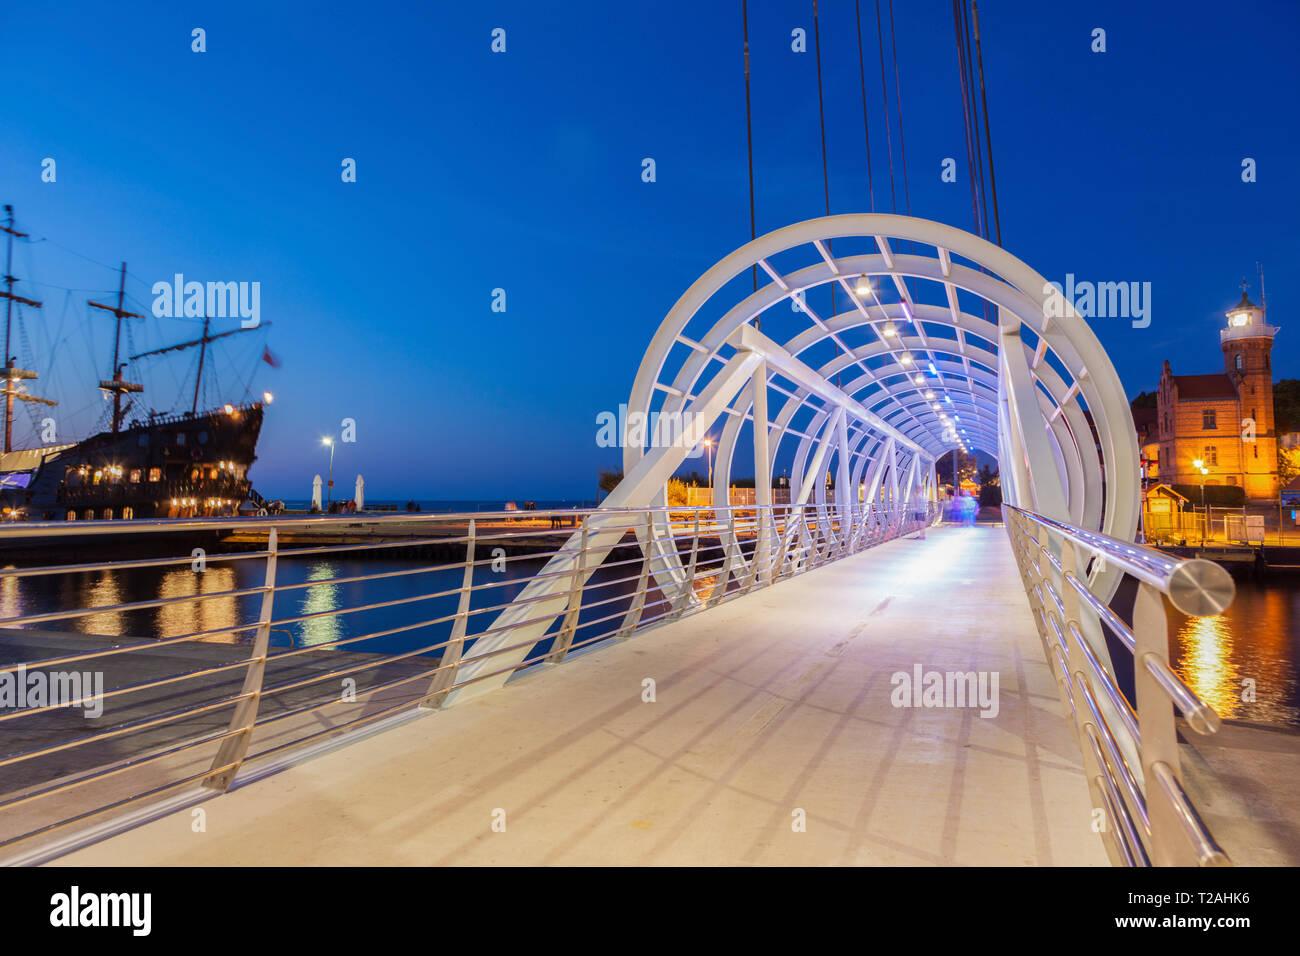 Pedestrian bridge in Ustka, Poland Stock Photo